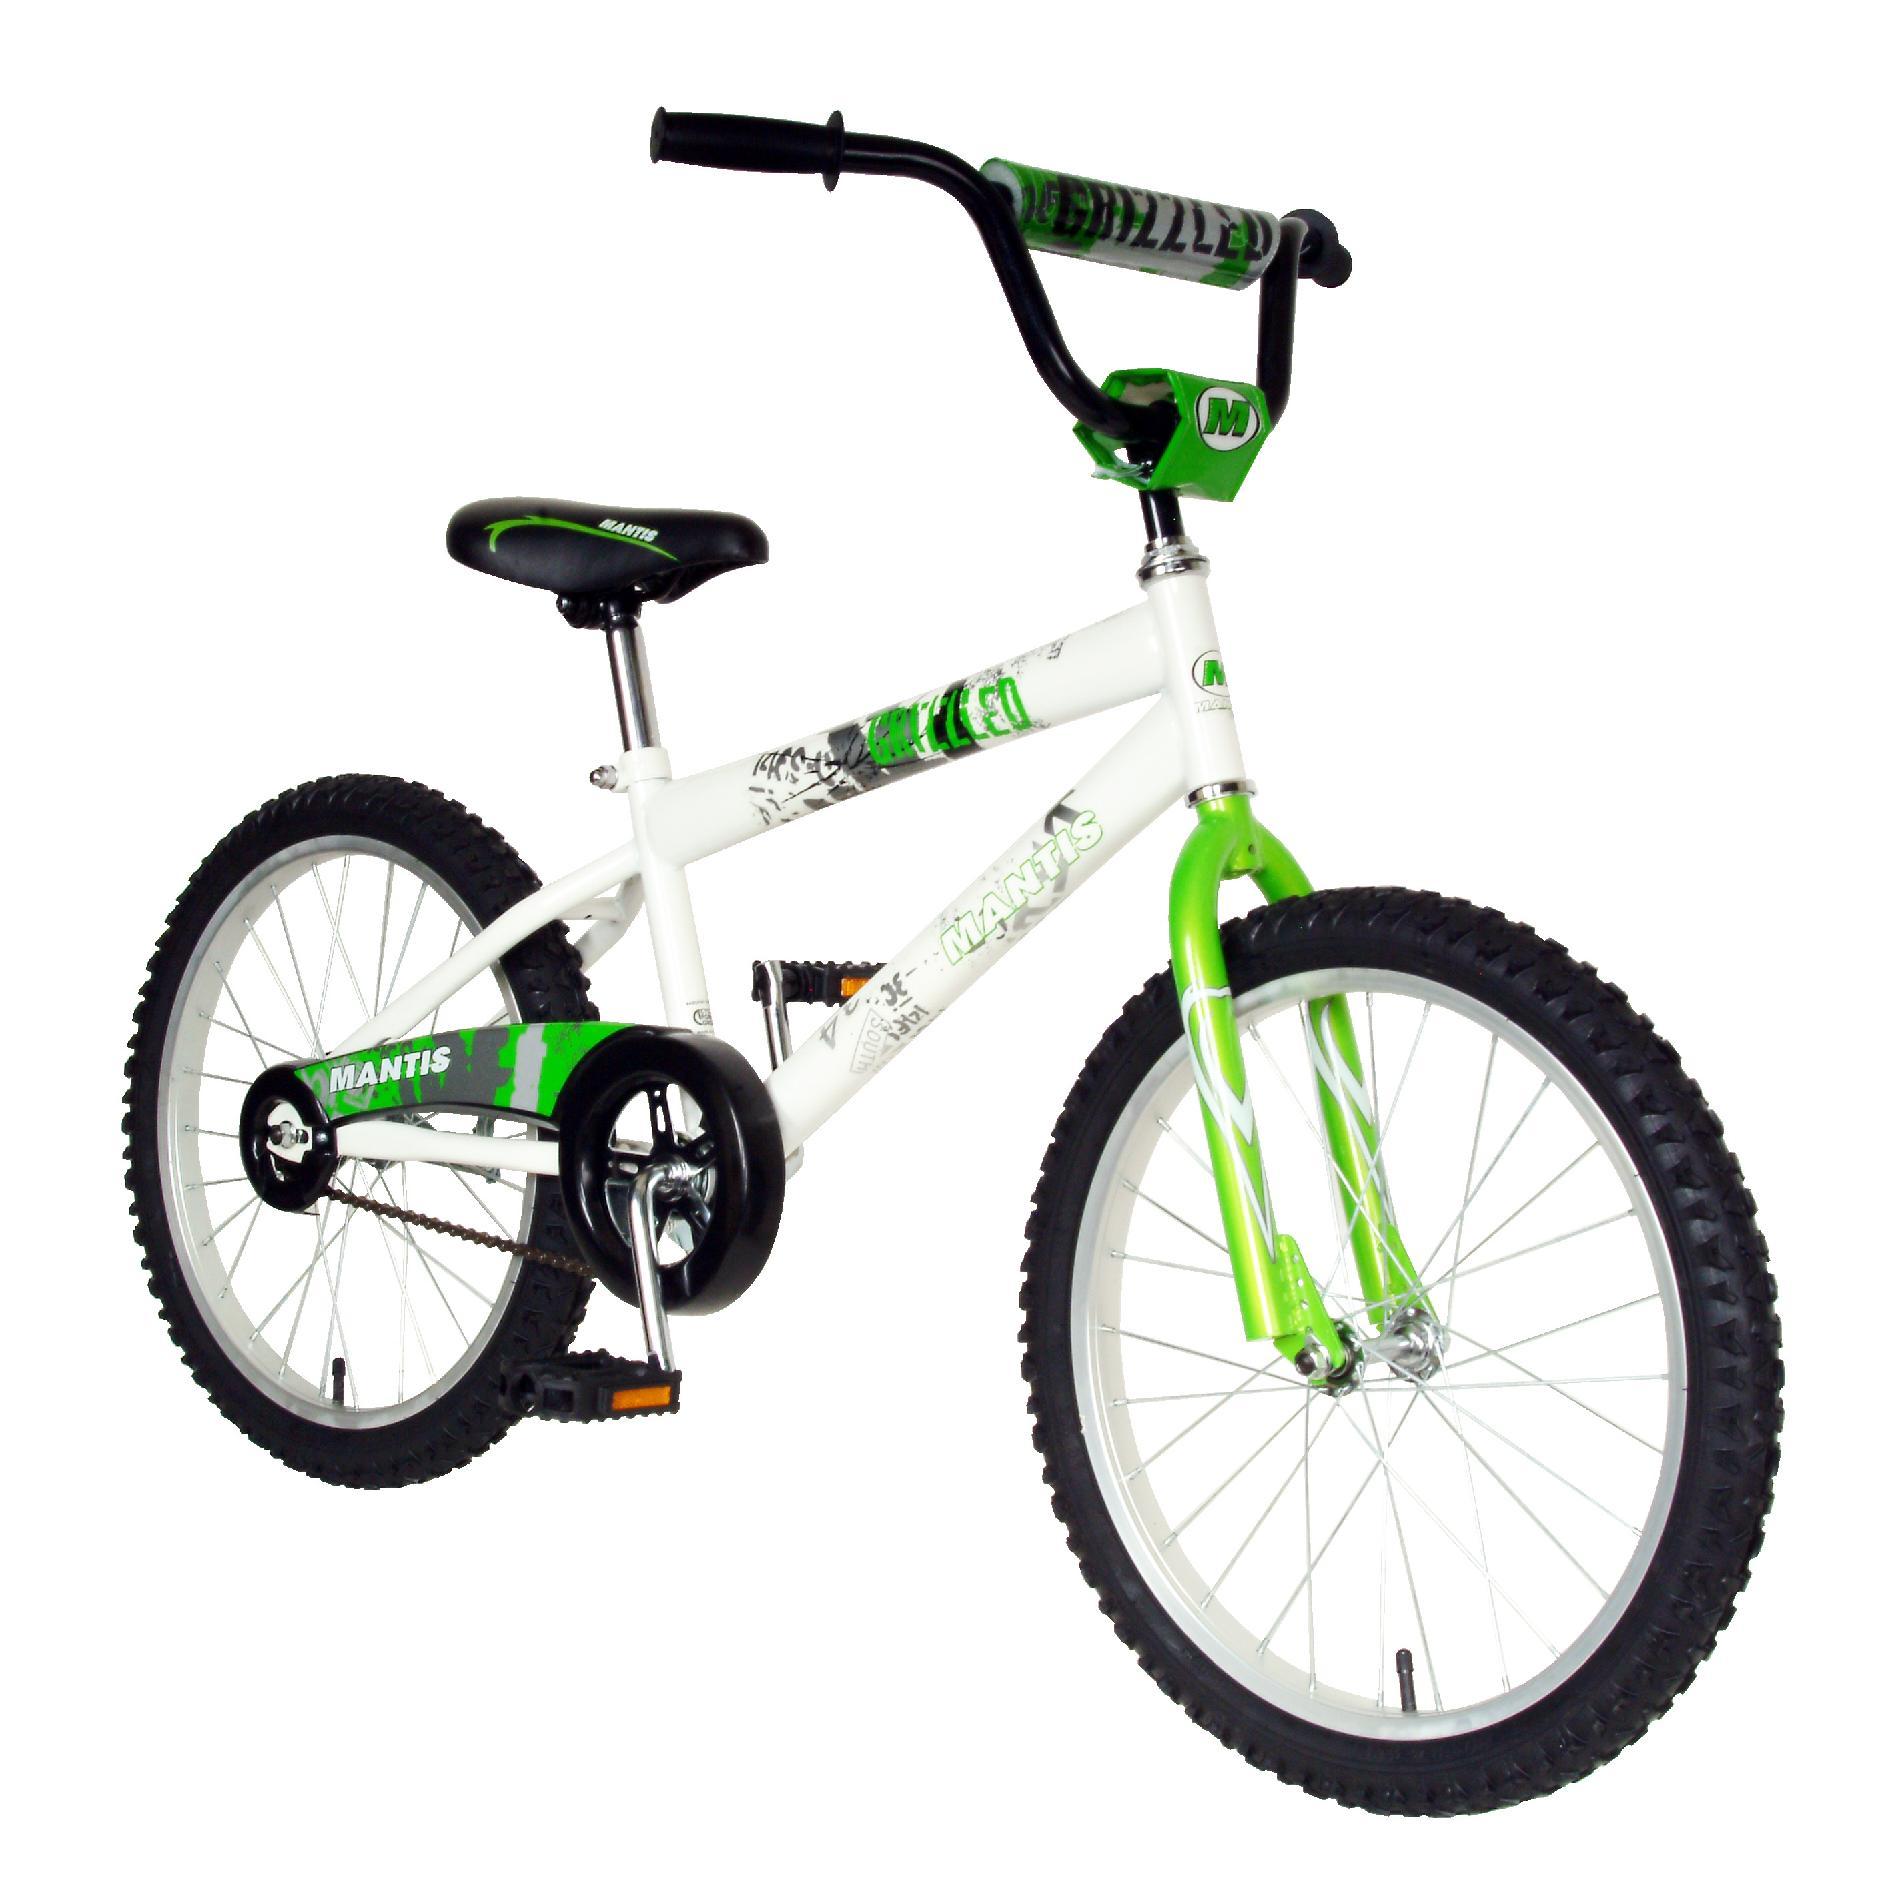 "Mantis Grizzled 20"" Boys BMX Bike"